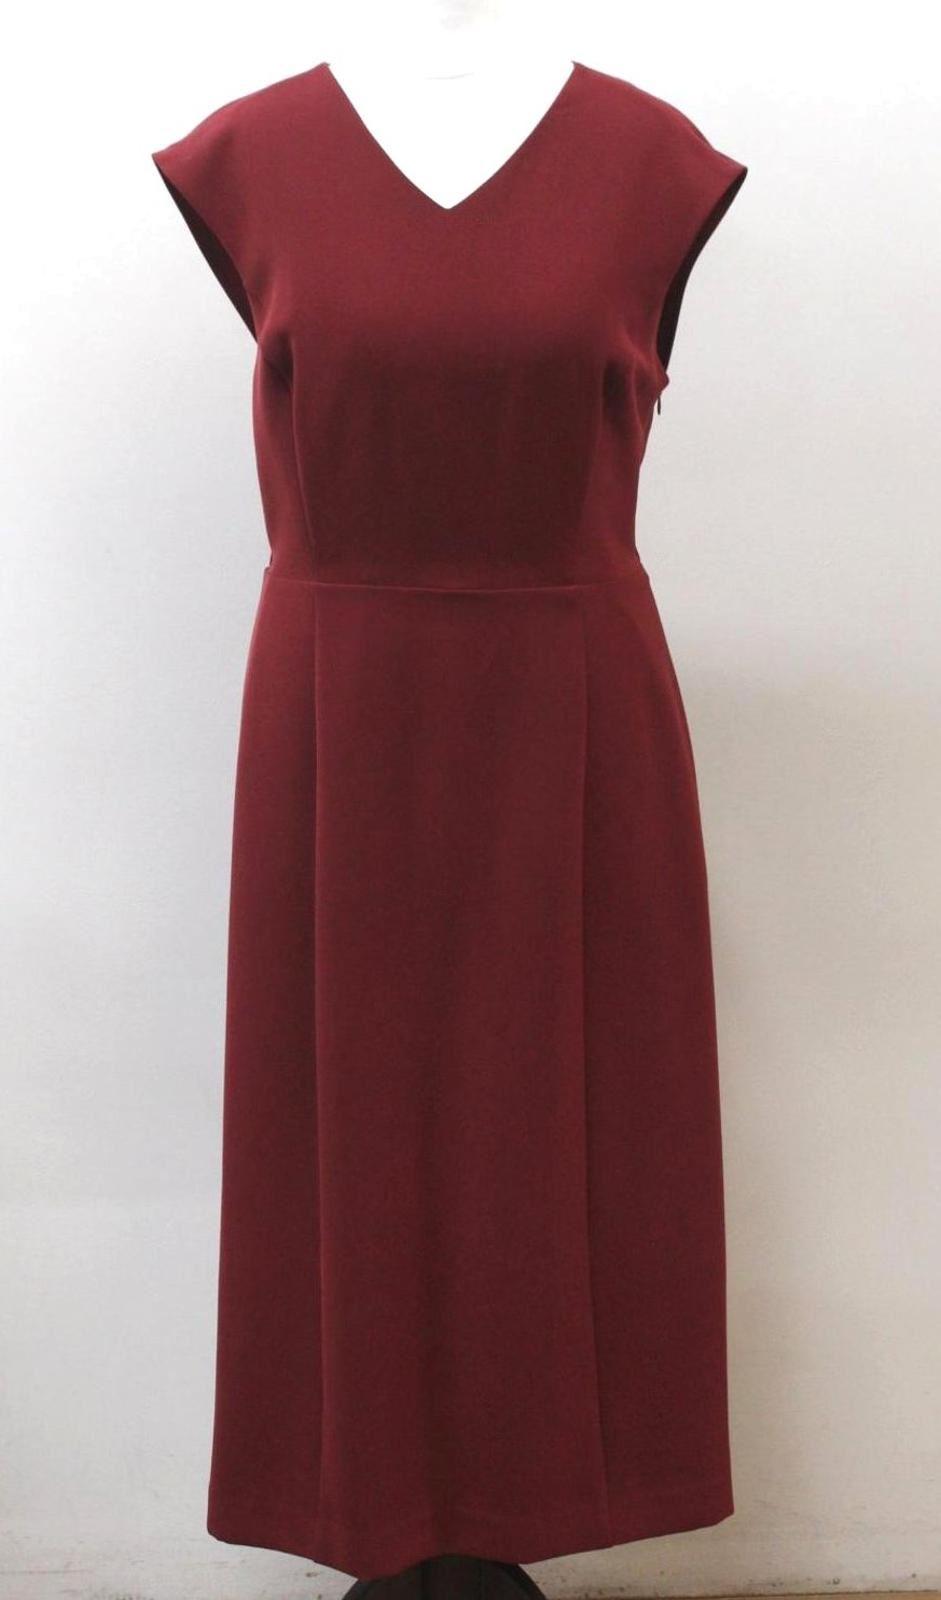 JAEGER-Ladies-Rusty-Red-Cap-Sleeve-V-Neckline-Shift-Drape-Back-Dress-UK10-EU38